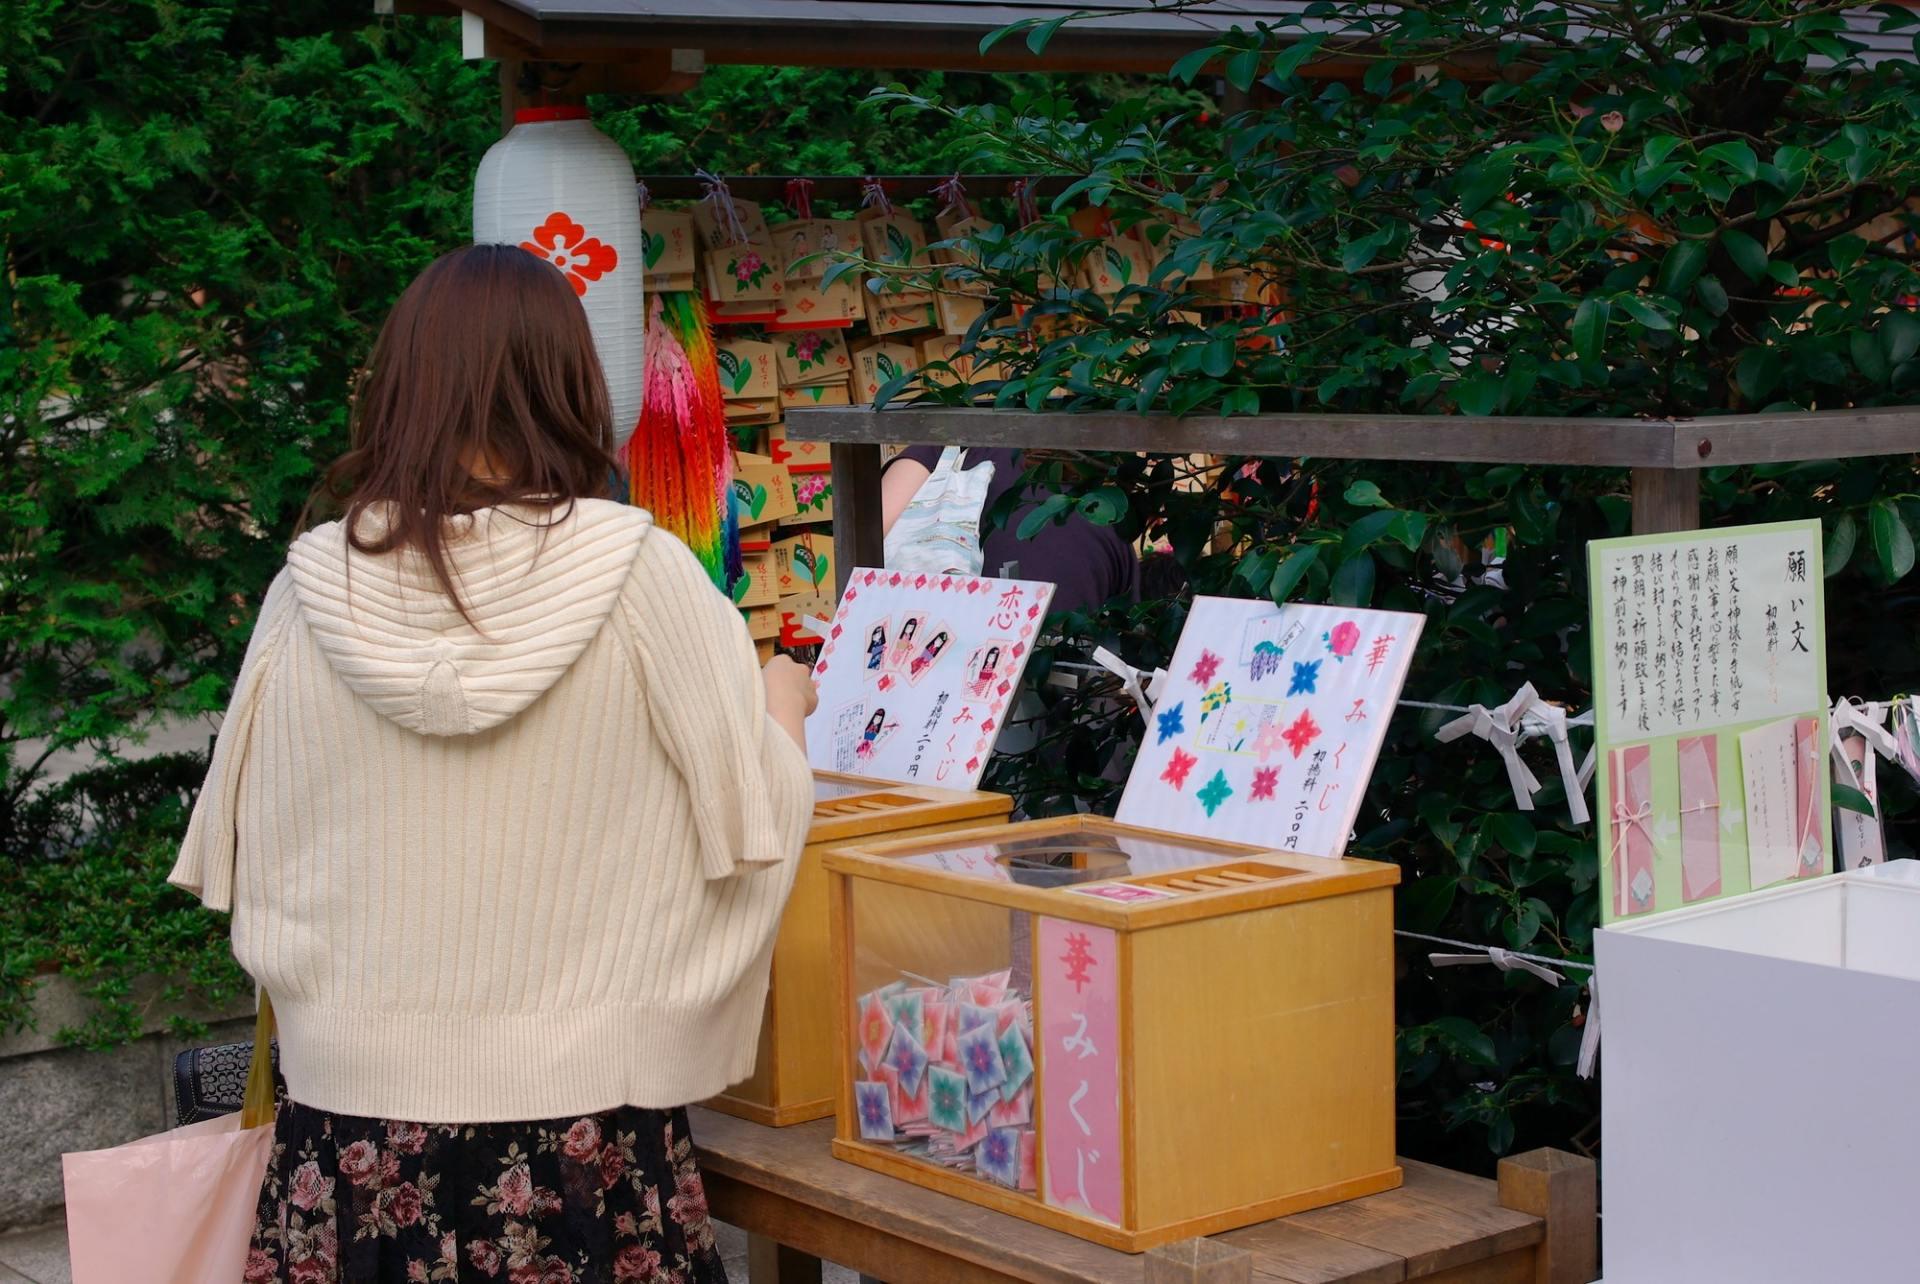 Romance, Fortune Readings (Omikuji)